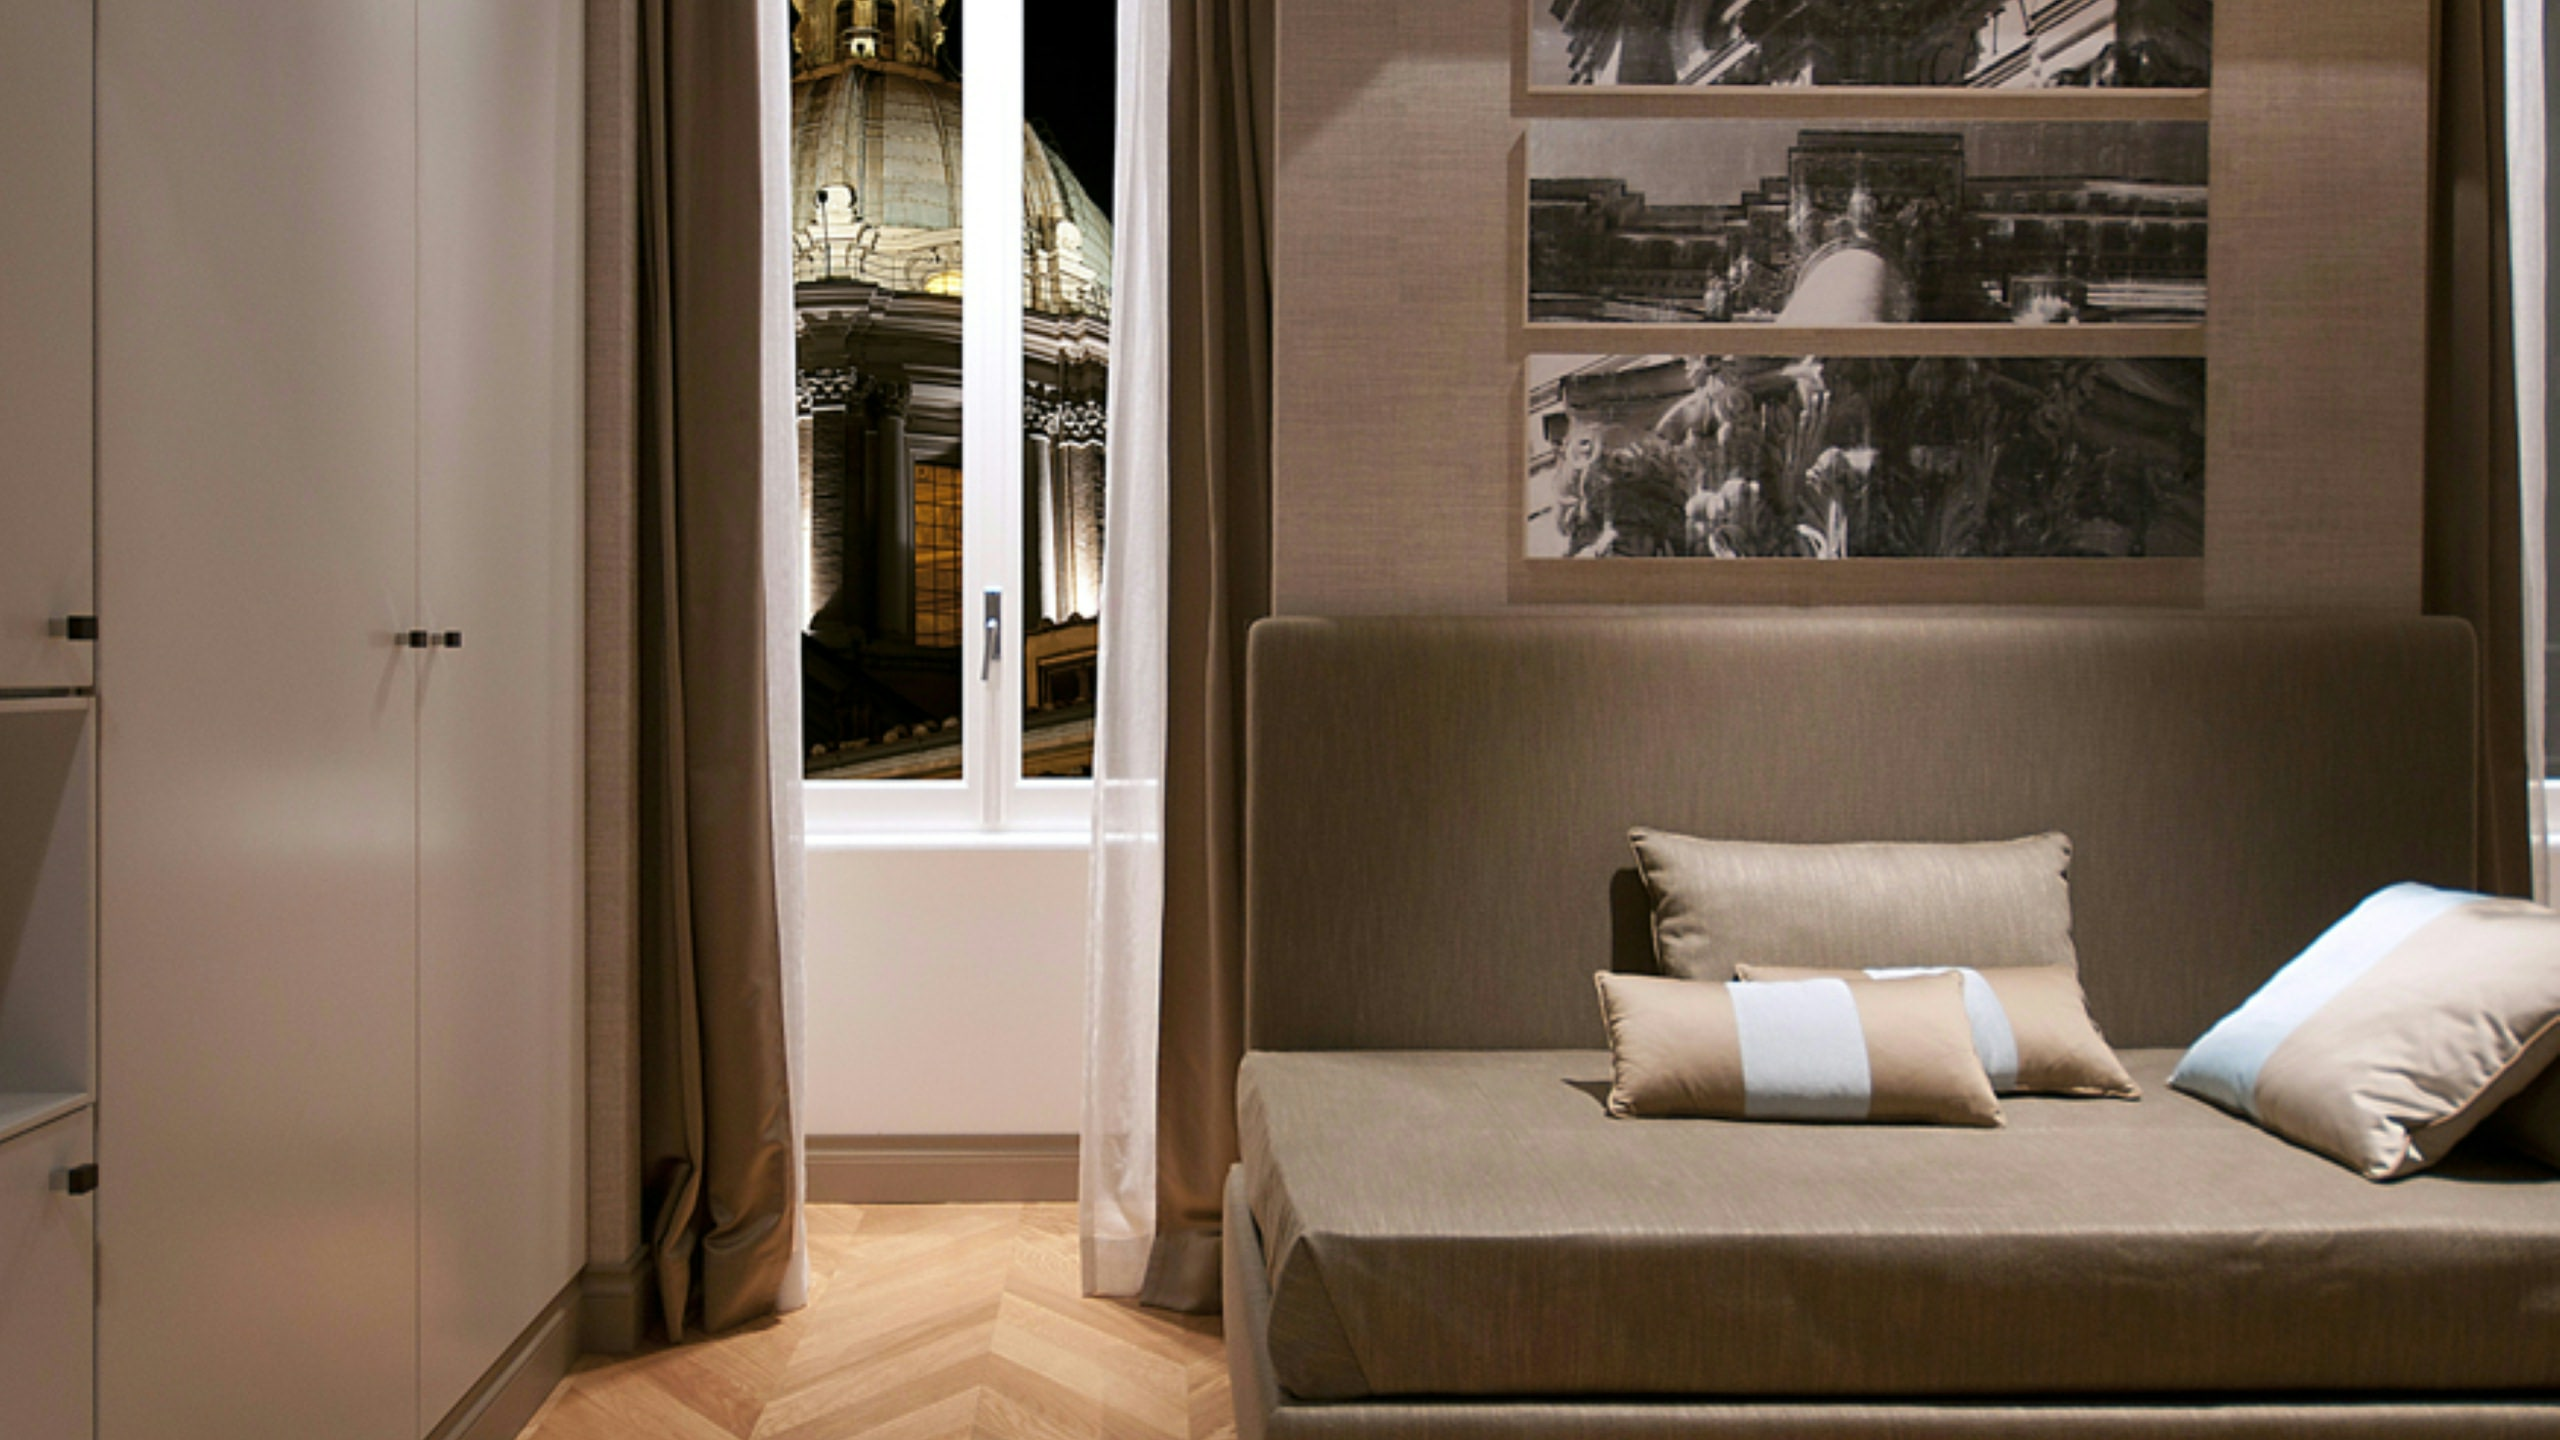 San-Carlo-Suite-Roma-suite-deluxe-2